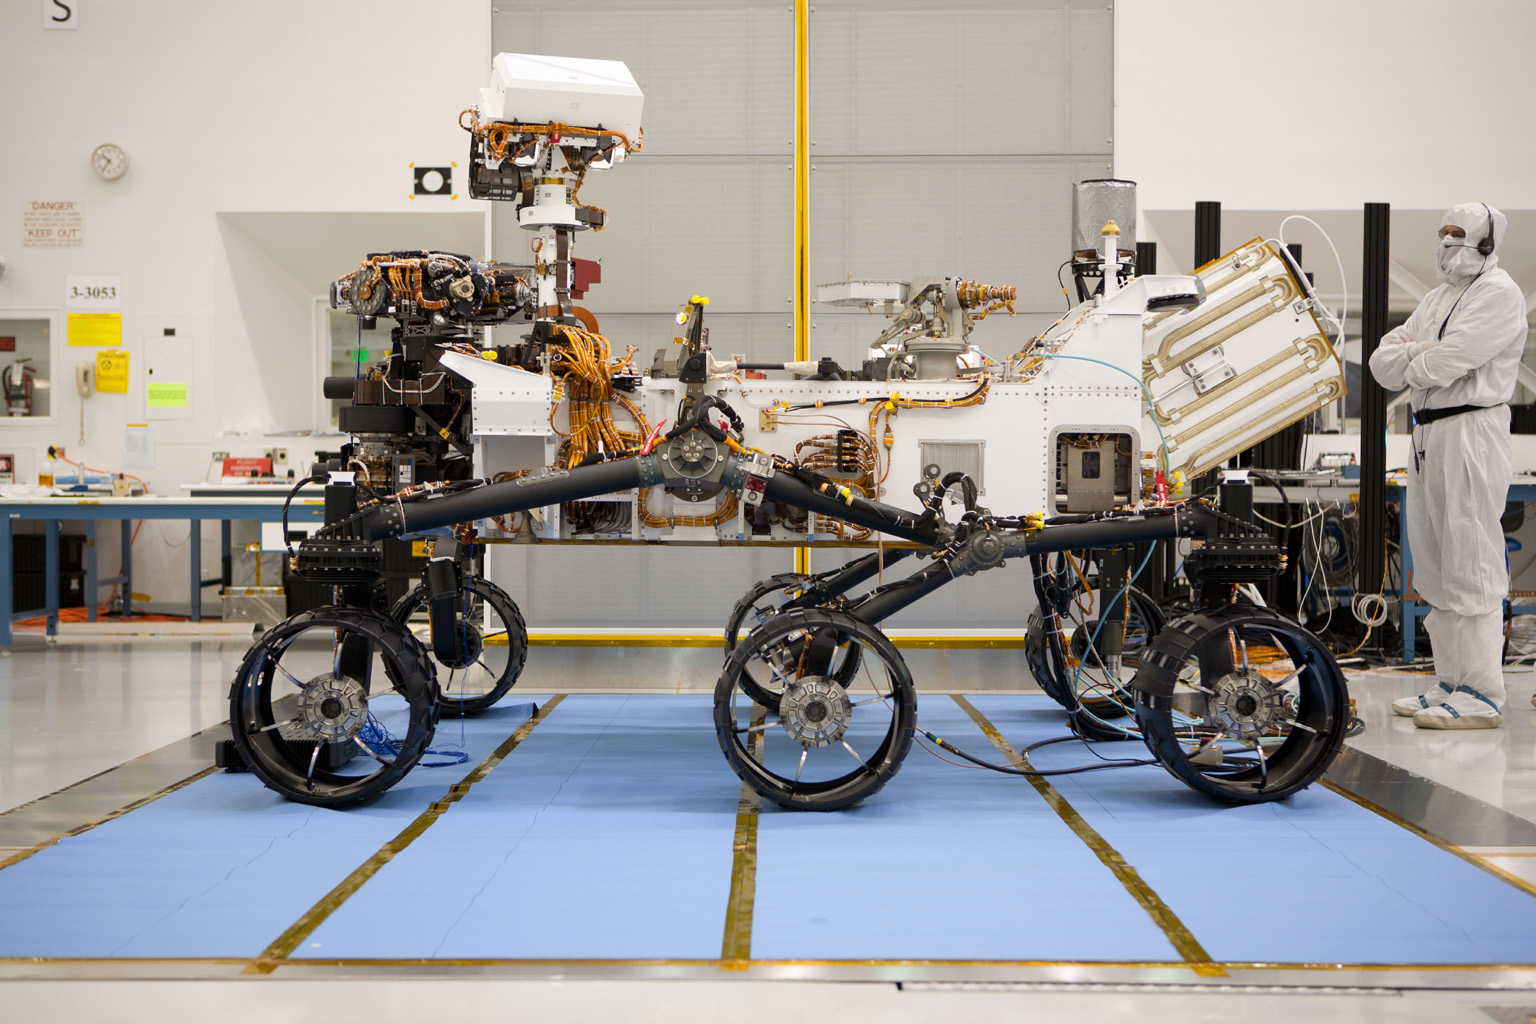 mars rover size - photo #18